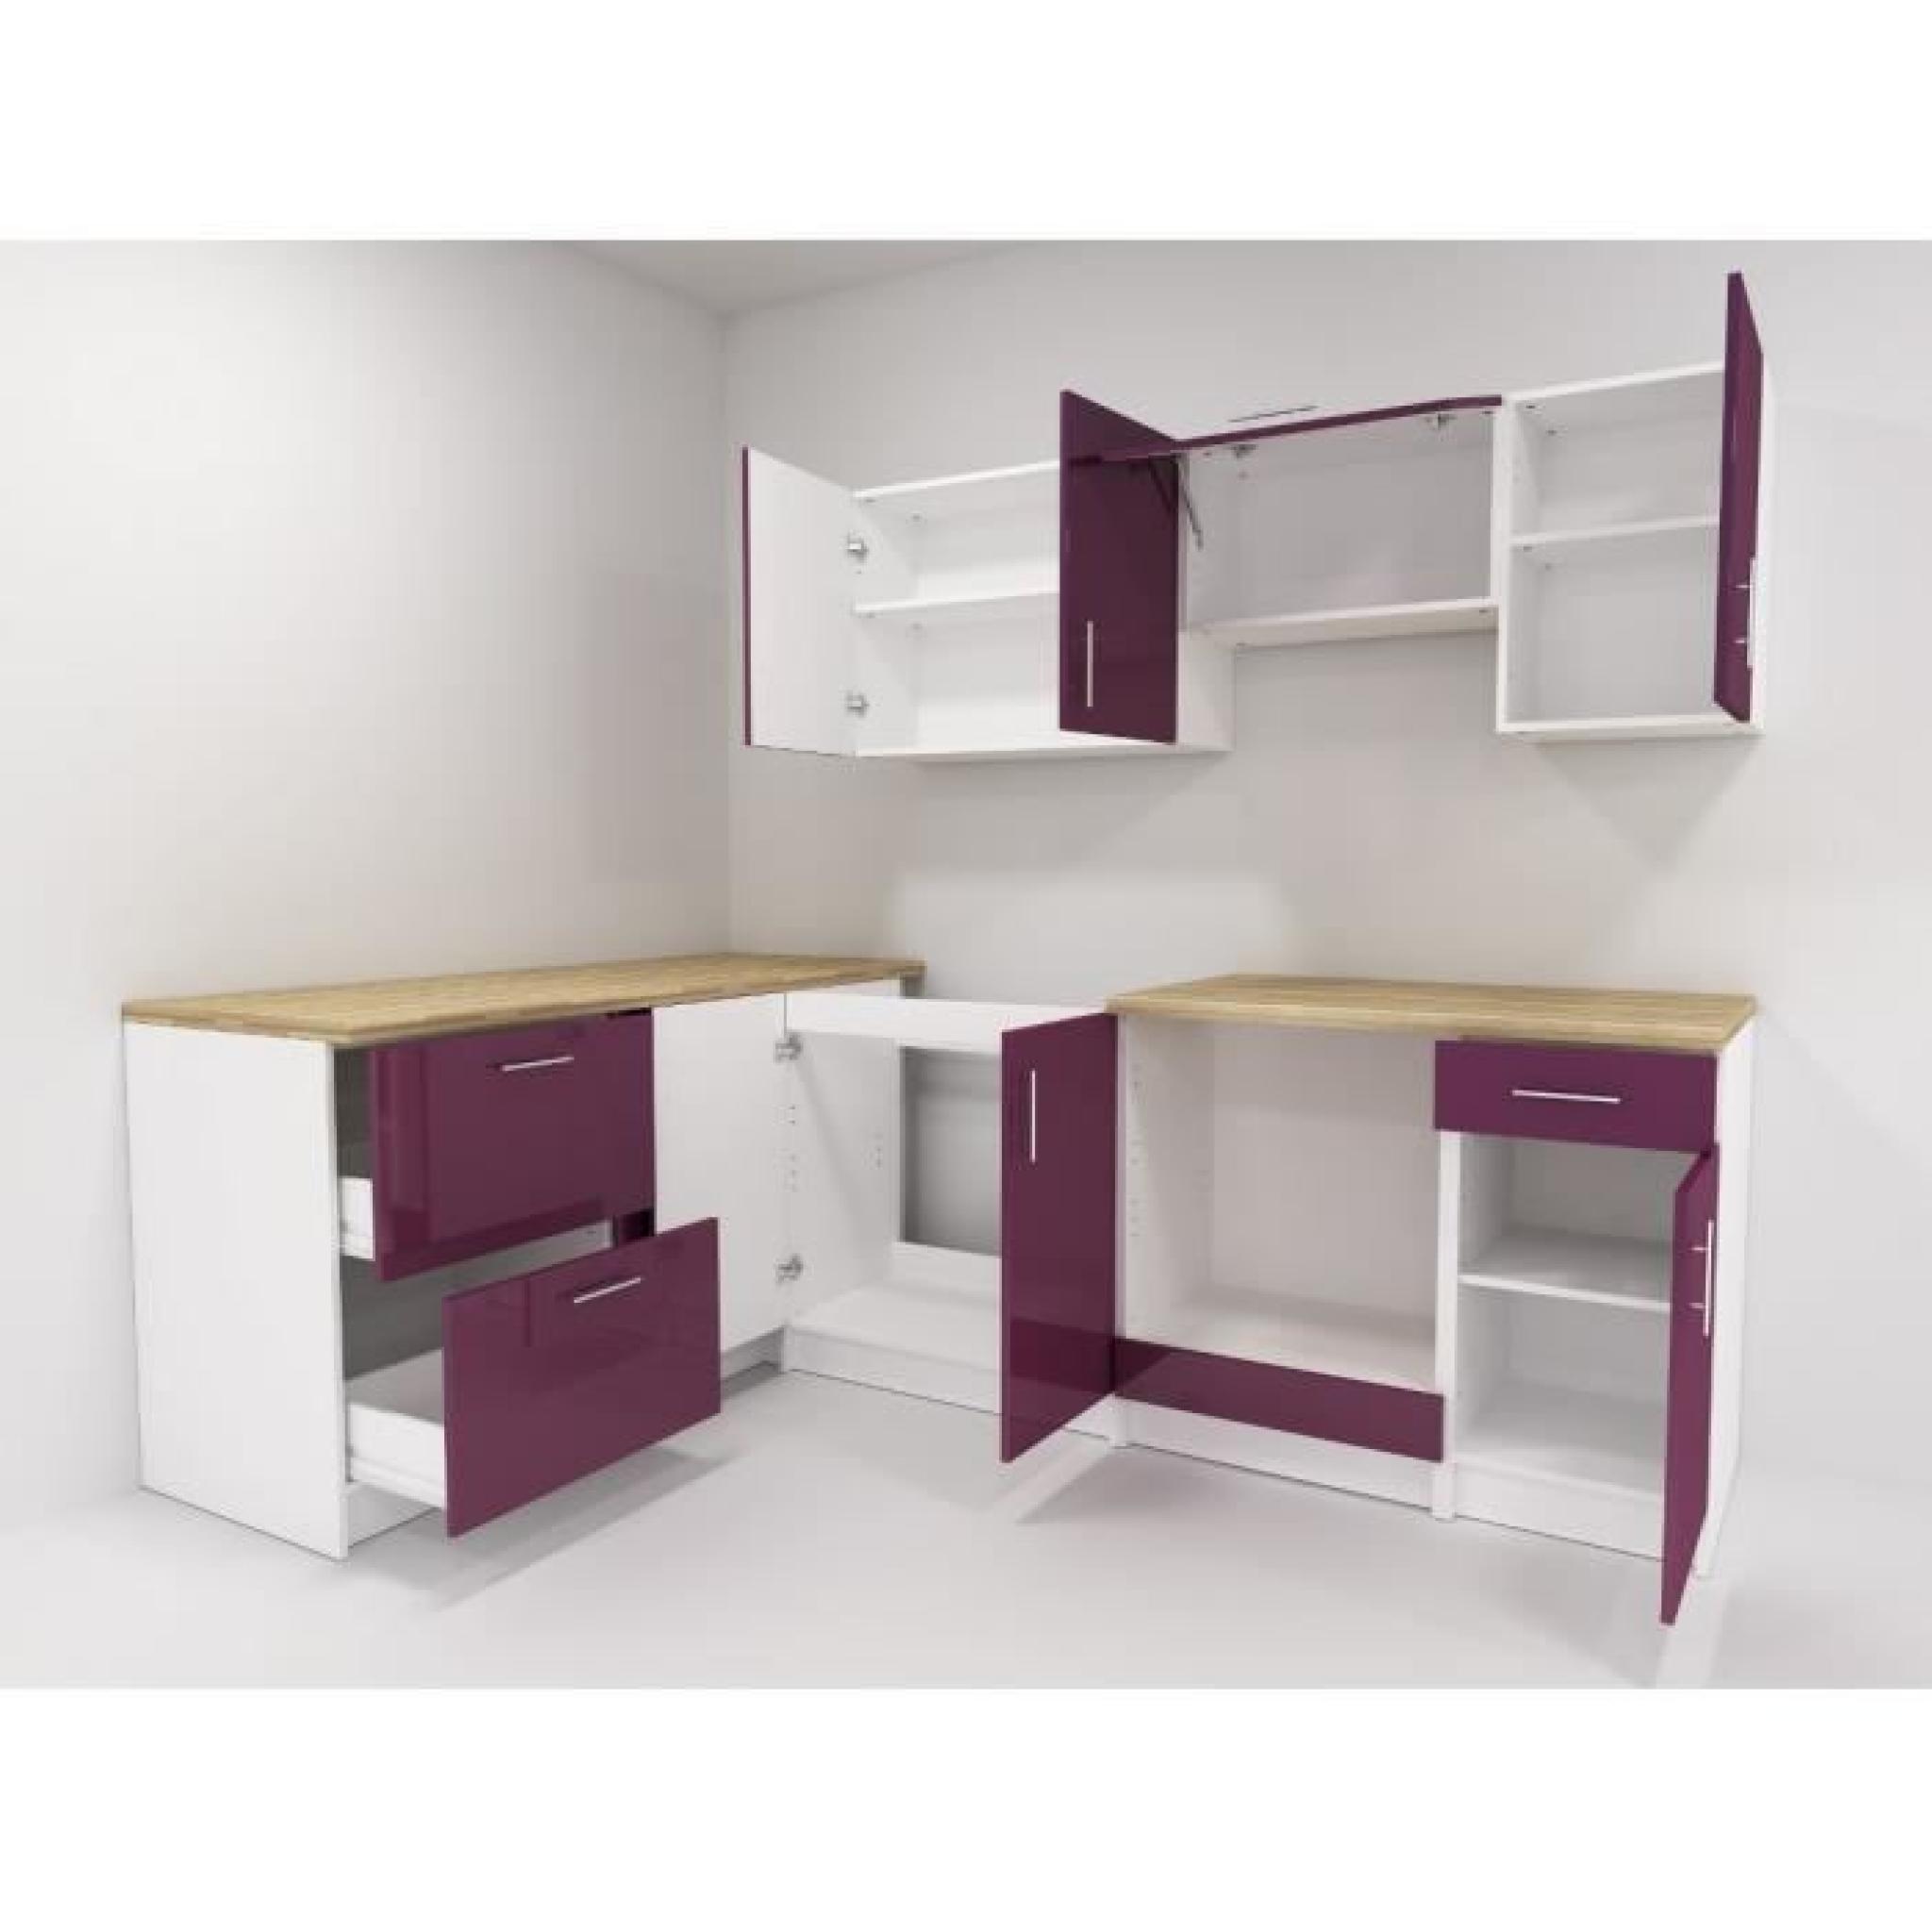 cosy cuisine compl te 2m80 laqu aubergine achat vente. Black Bedroom Furniture Sets. Home Design Ideas